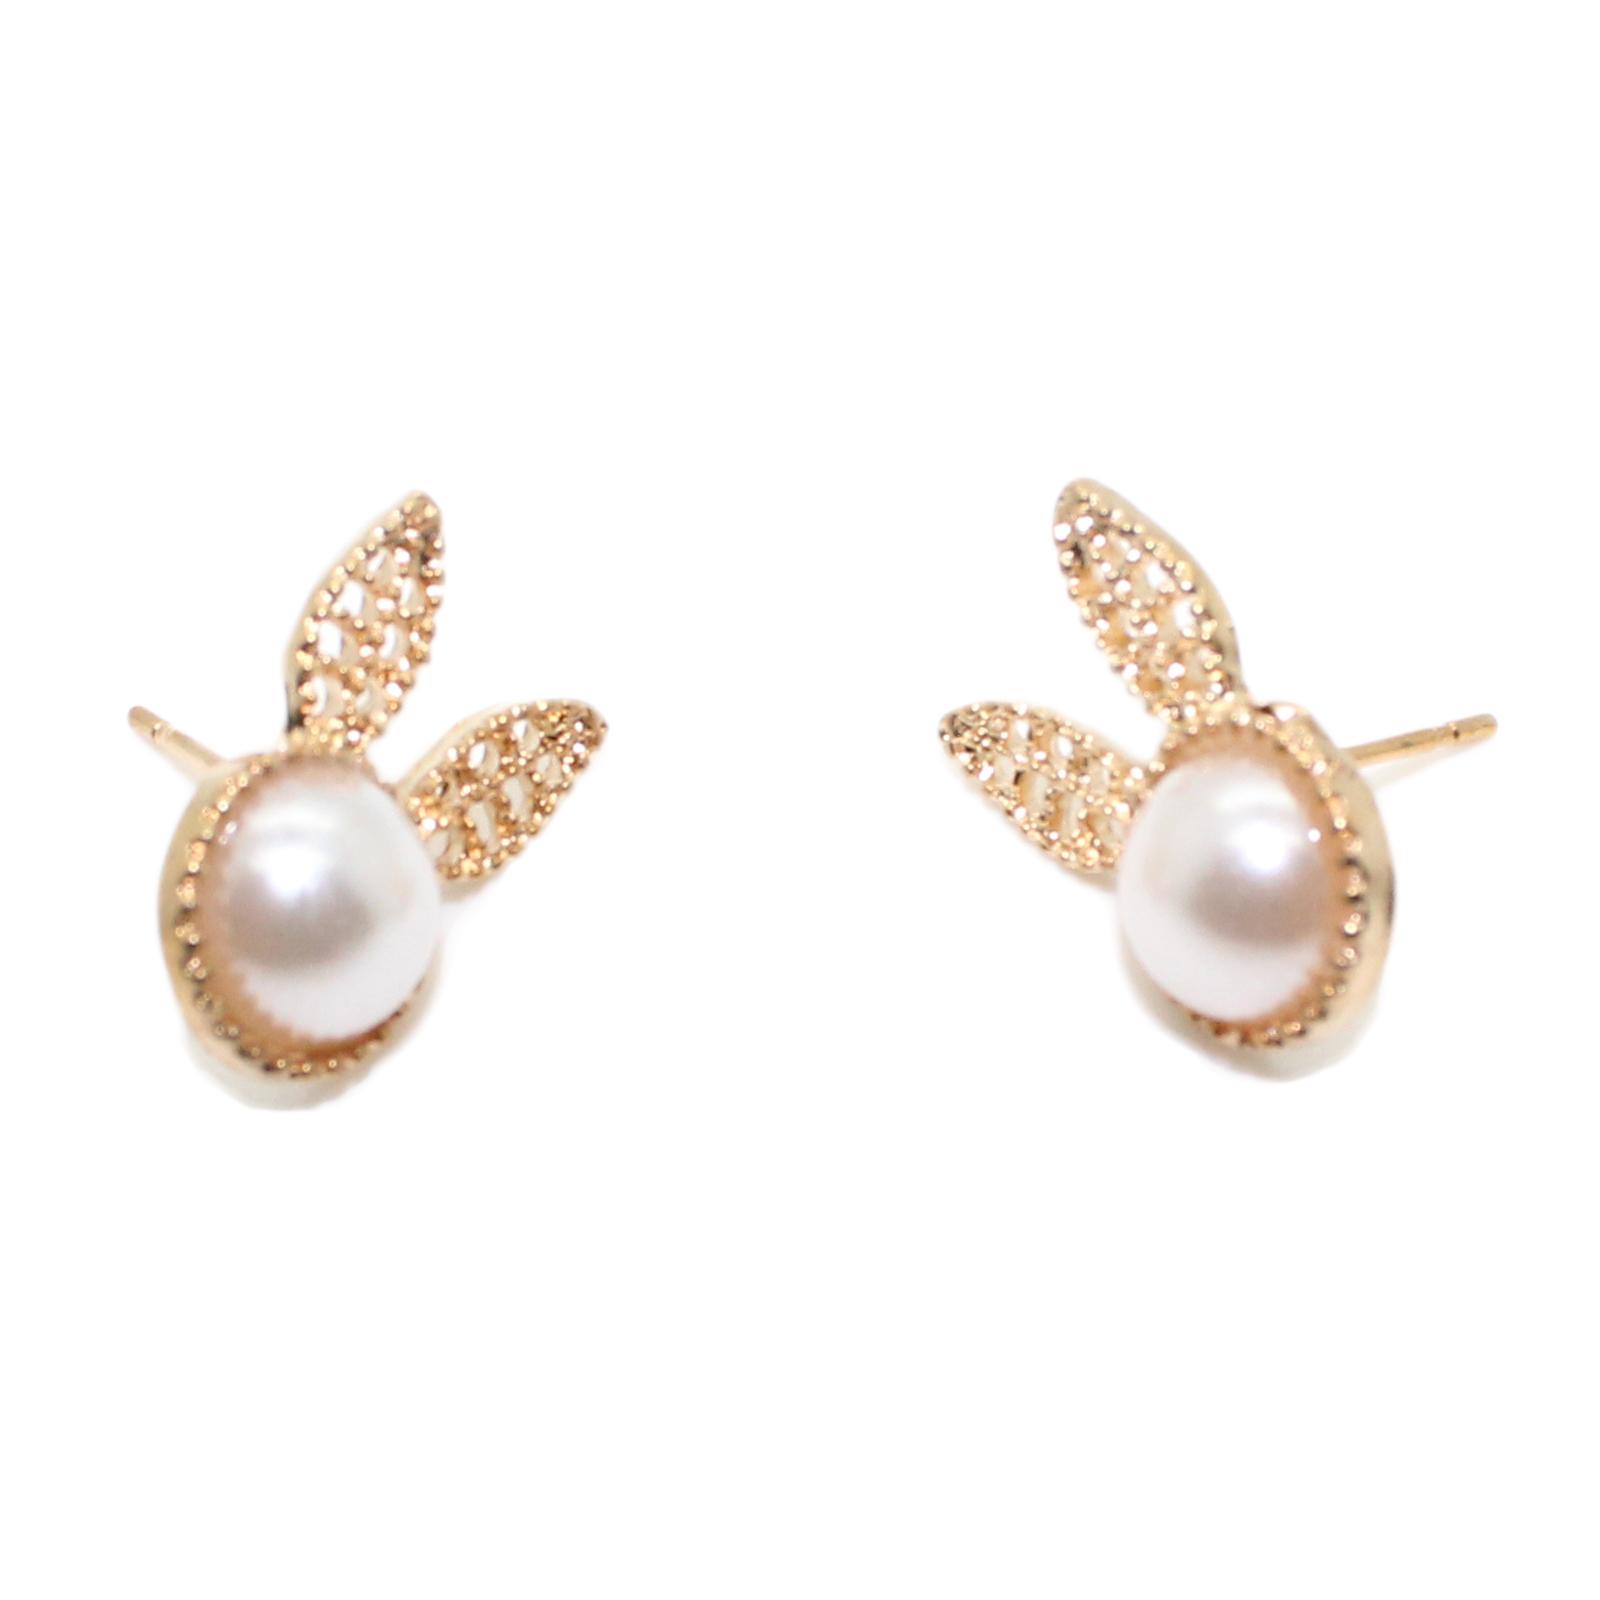 Imitation Pearl Rabbit Stud Fashion Jewelry Earrings